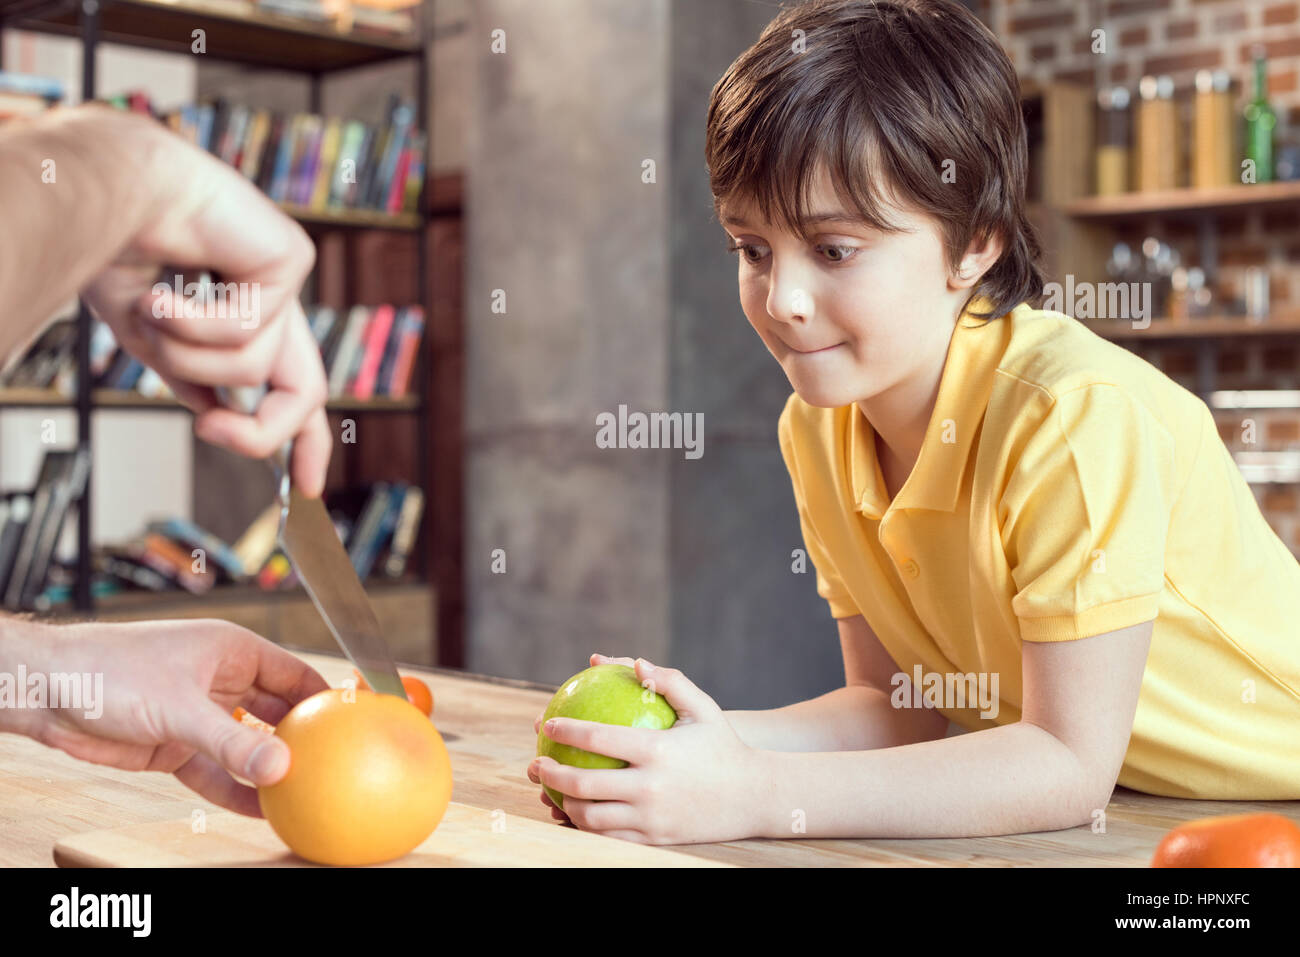 süß lächelnd Sohn sah Vater schneiden Grapefruit mit Messer Stockbild